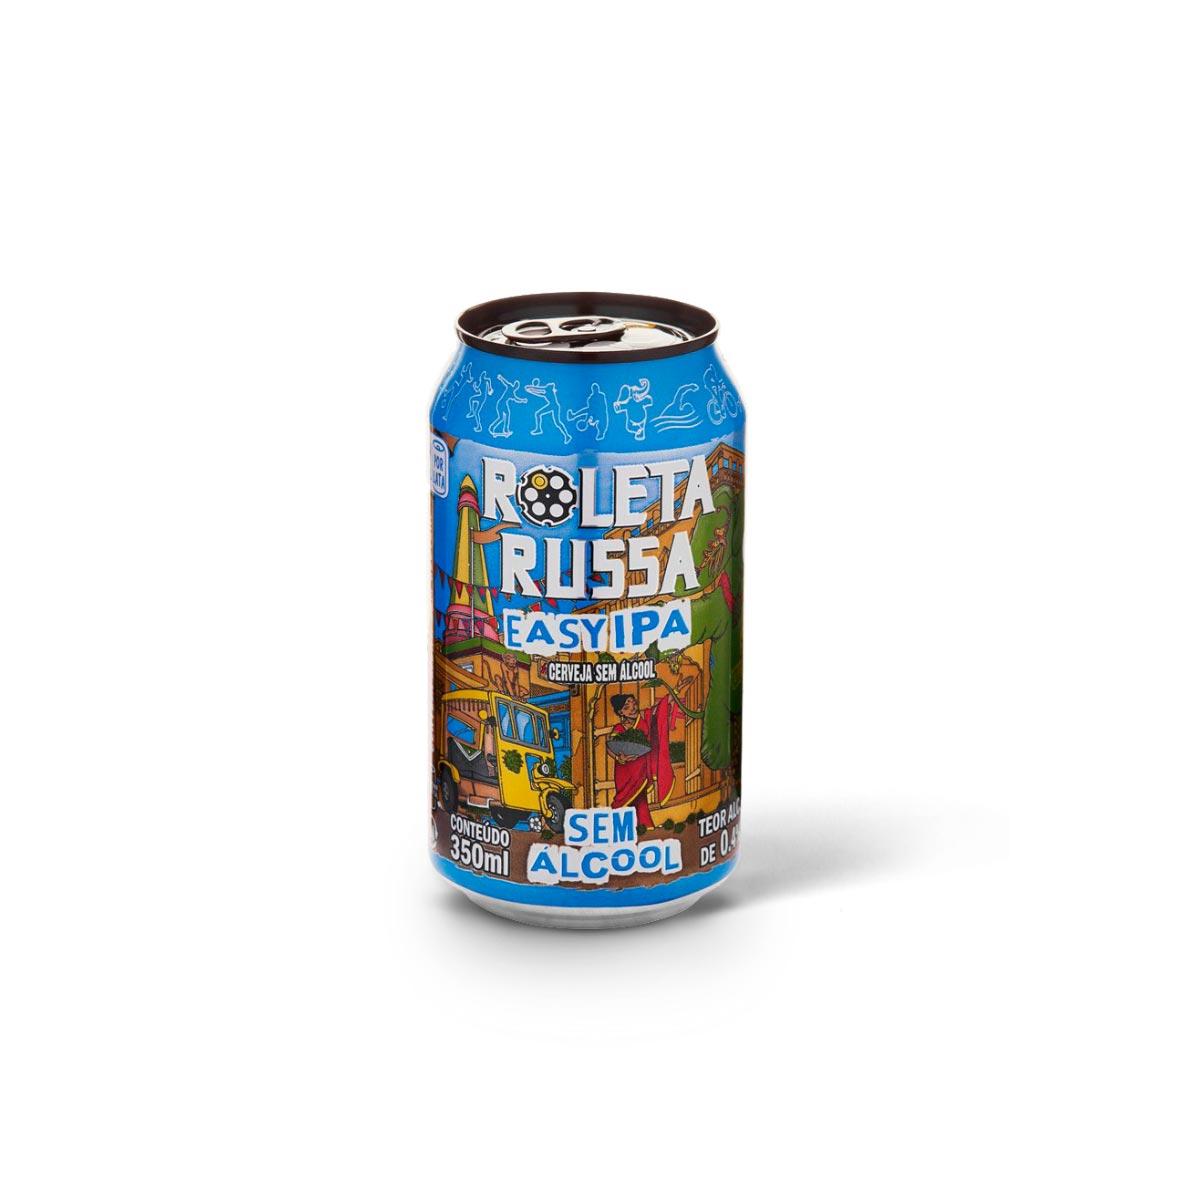 Roleta Russa Easy IPA sem álcool 350ml lata